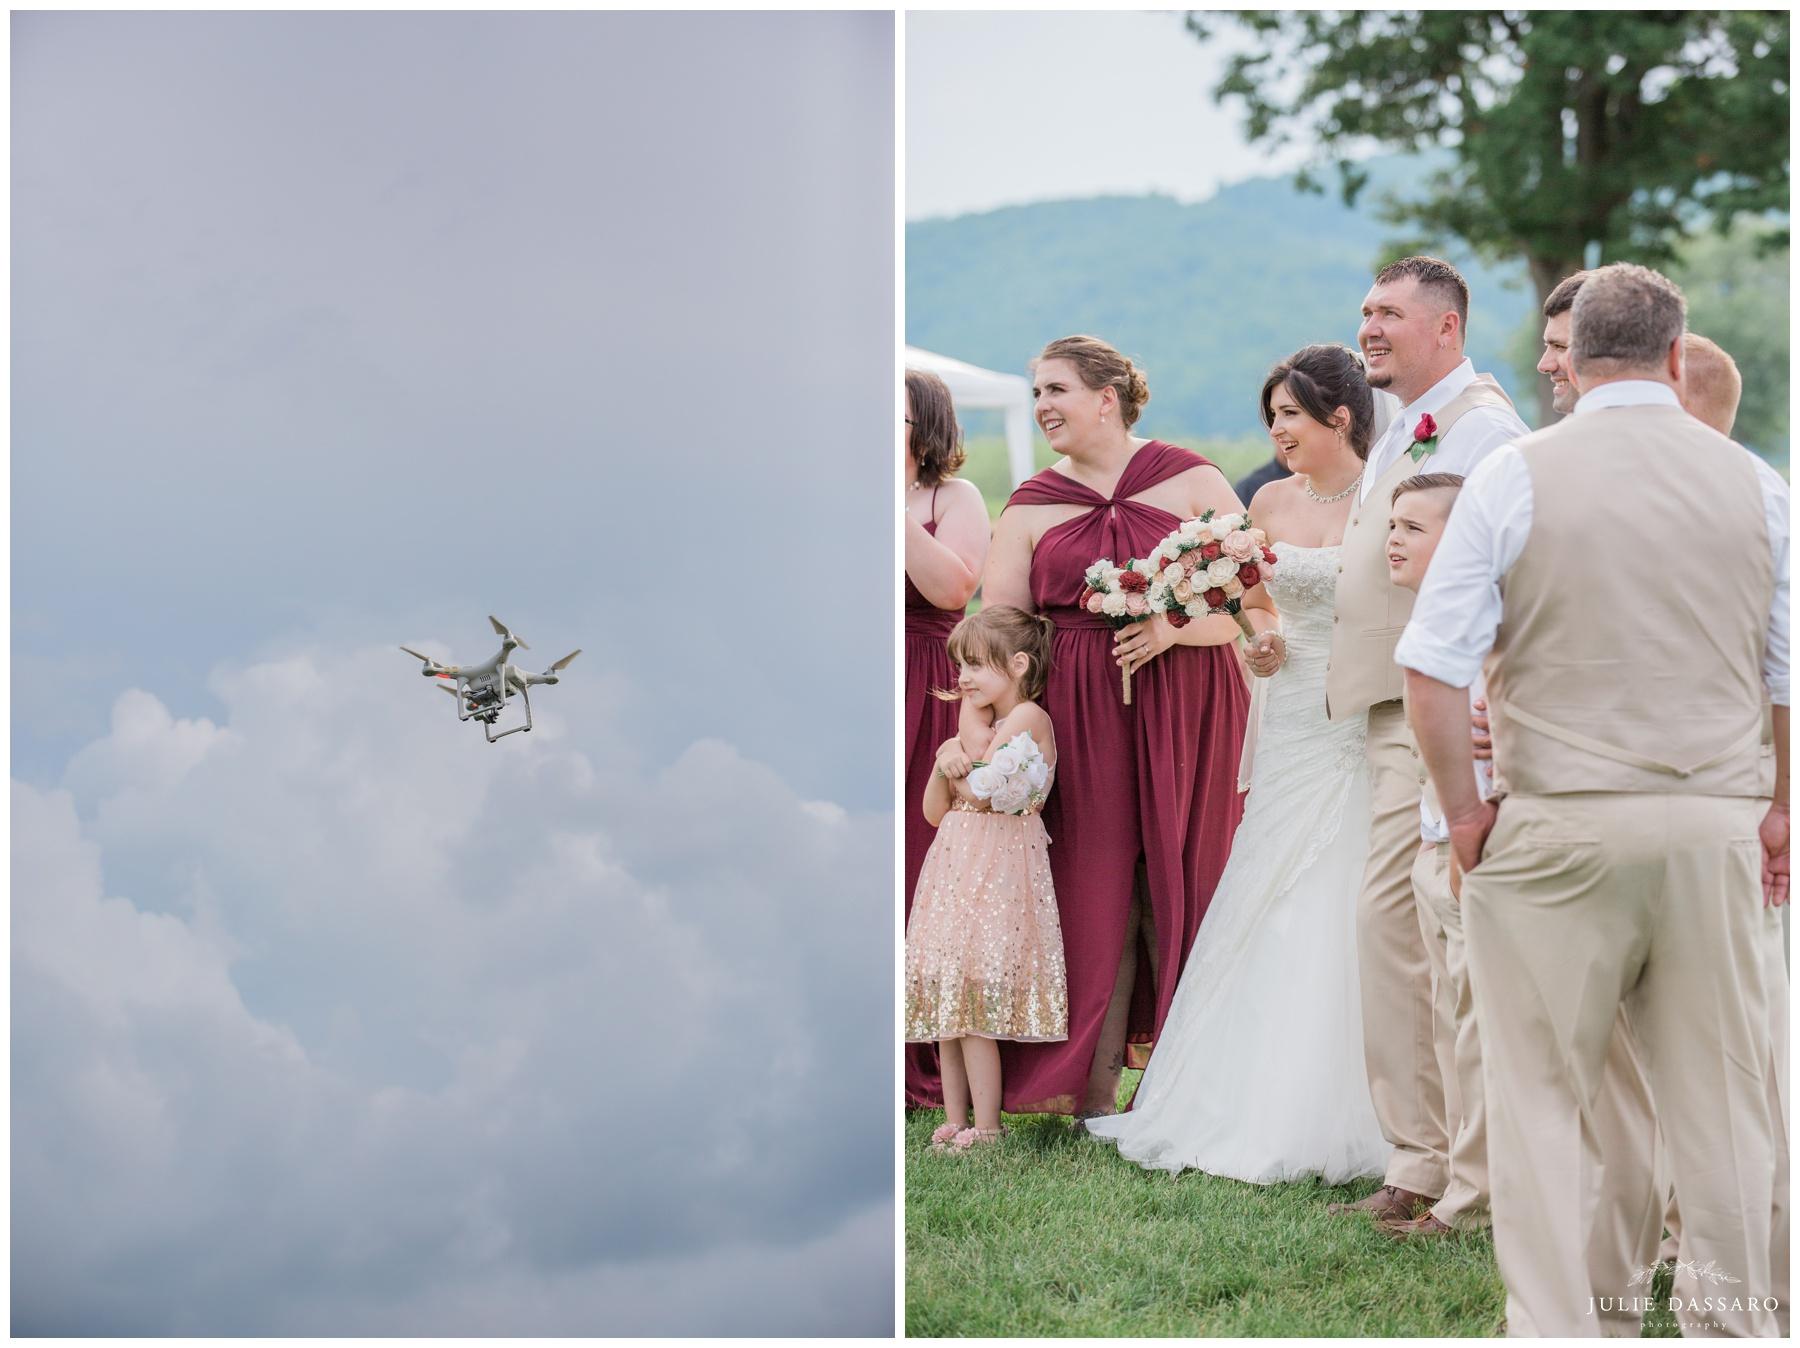 NJ drone at wedding